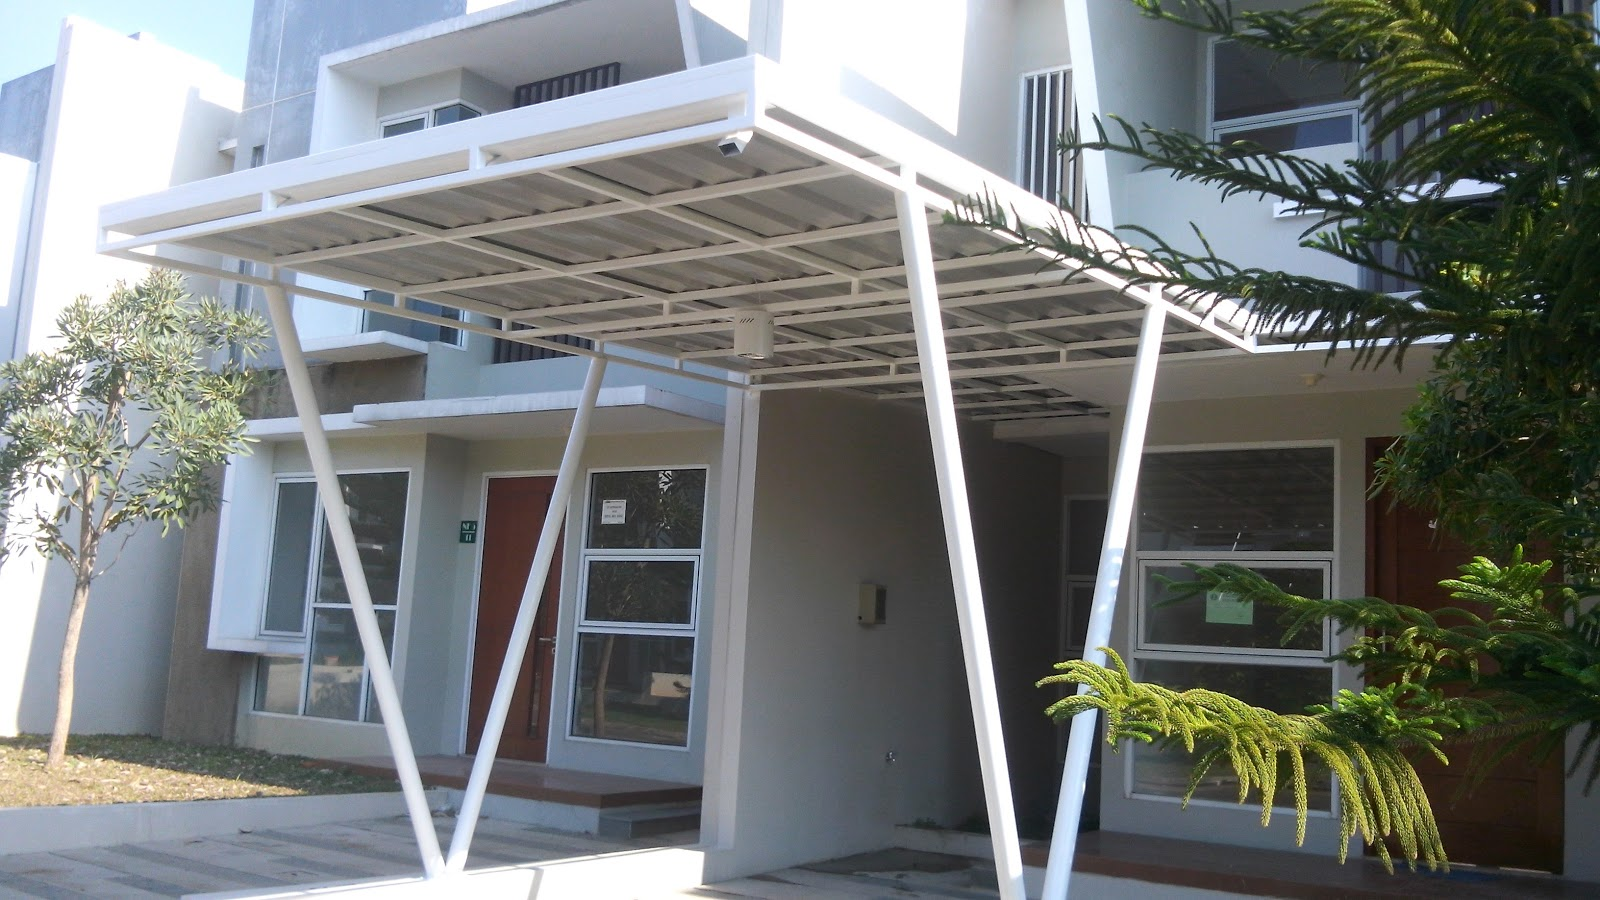 Harga Kanopi Baja Ringan Per Meter Persegi Ganti Atap Garasi Jakarta: Jakarta